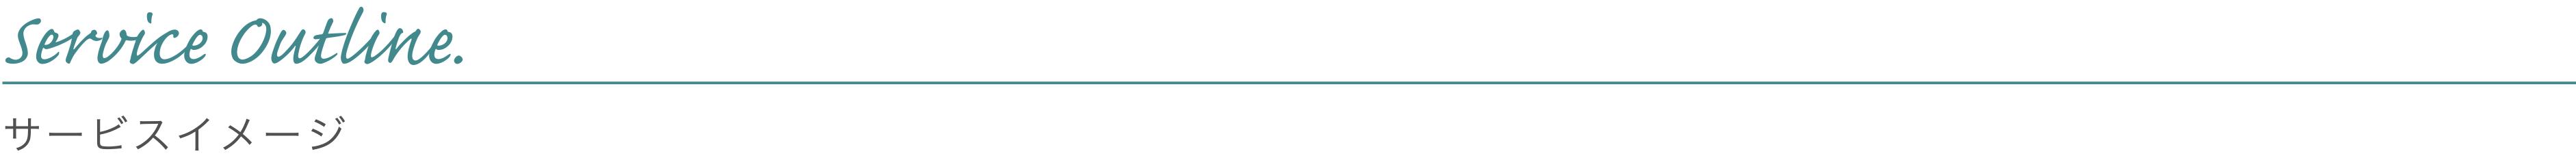 Service Outline / サービスイメージ